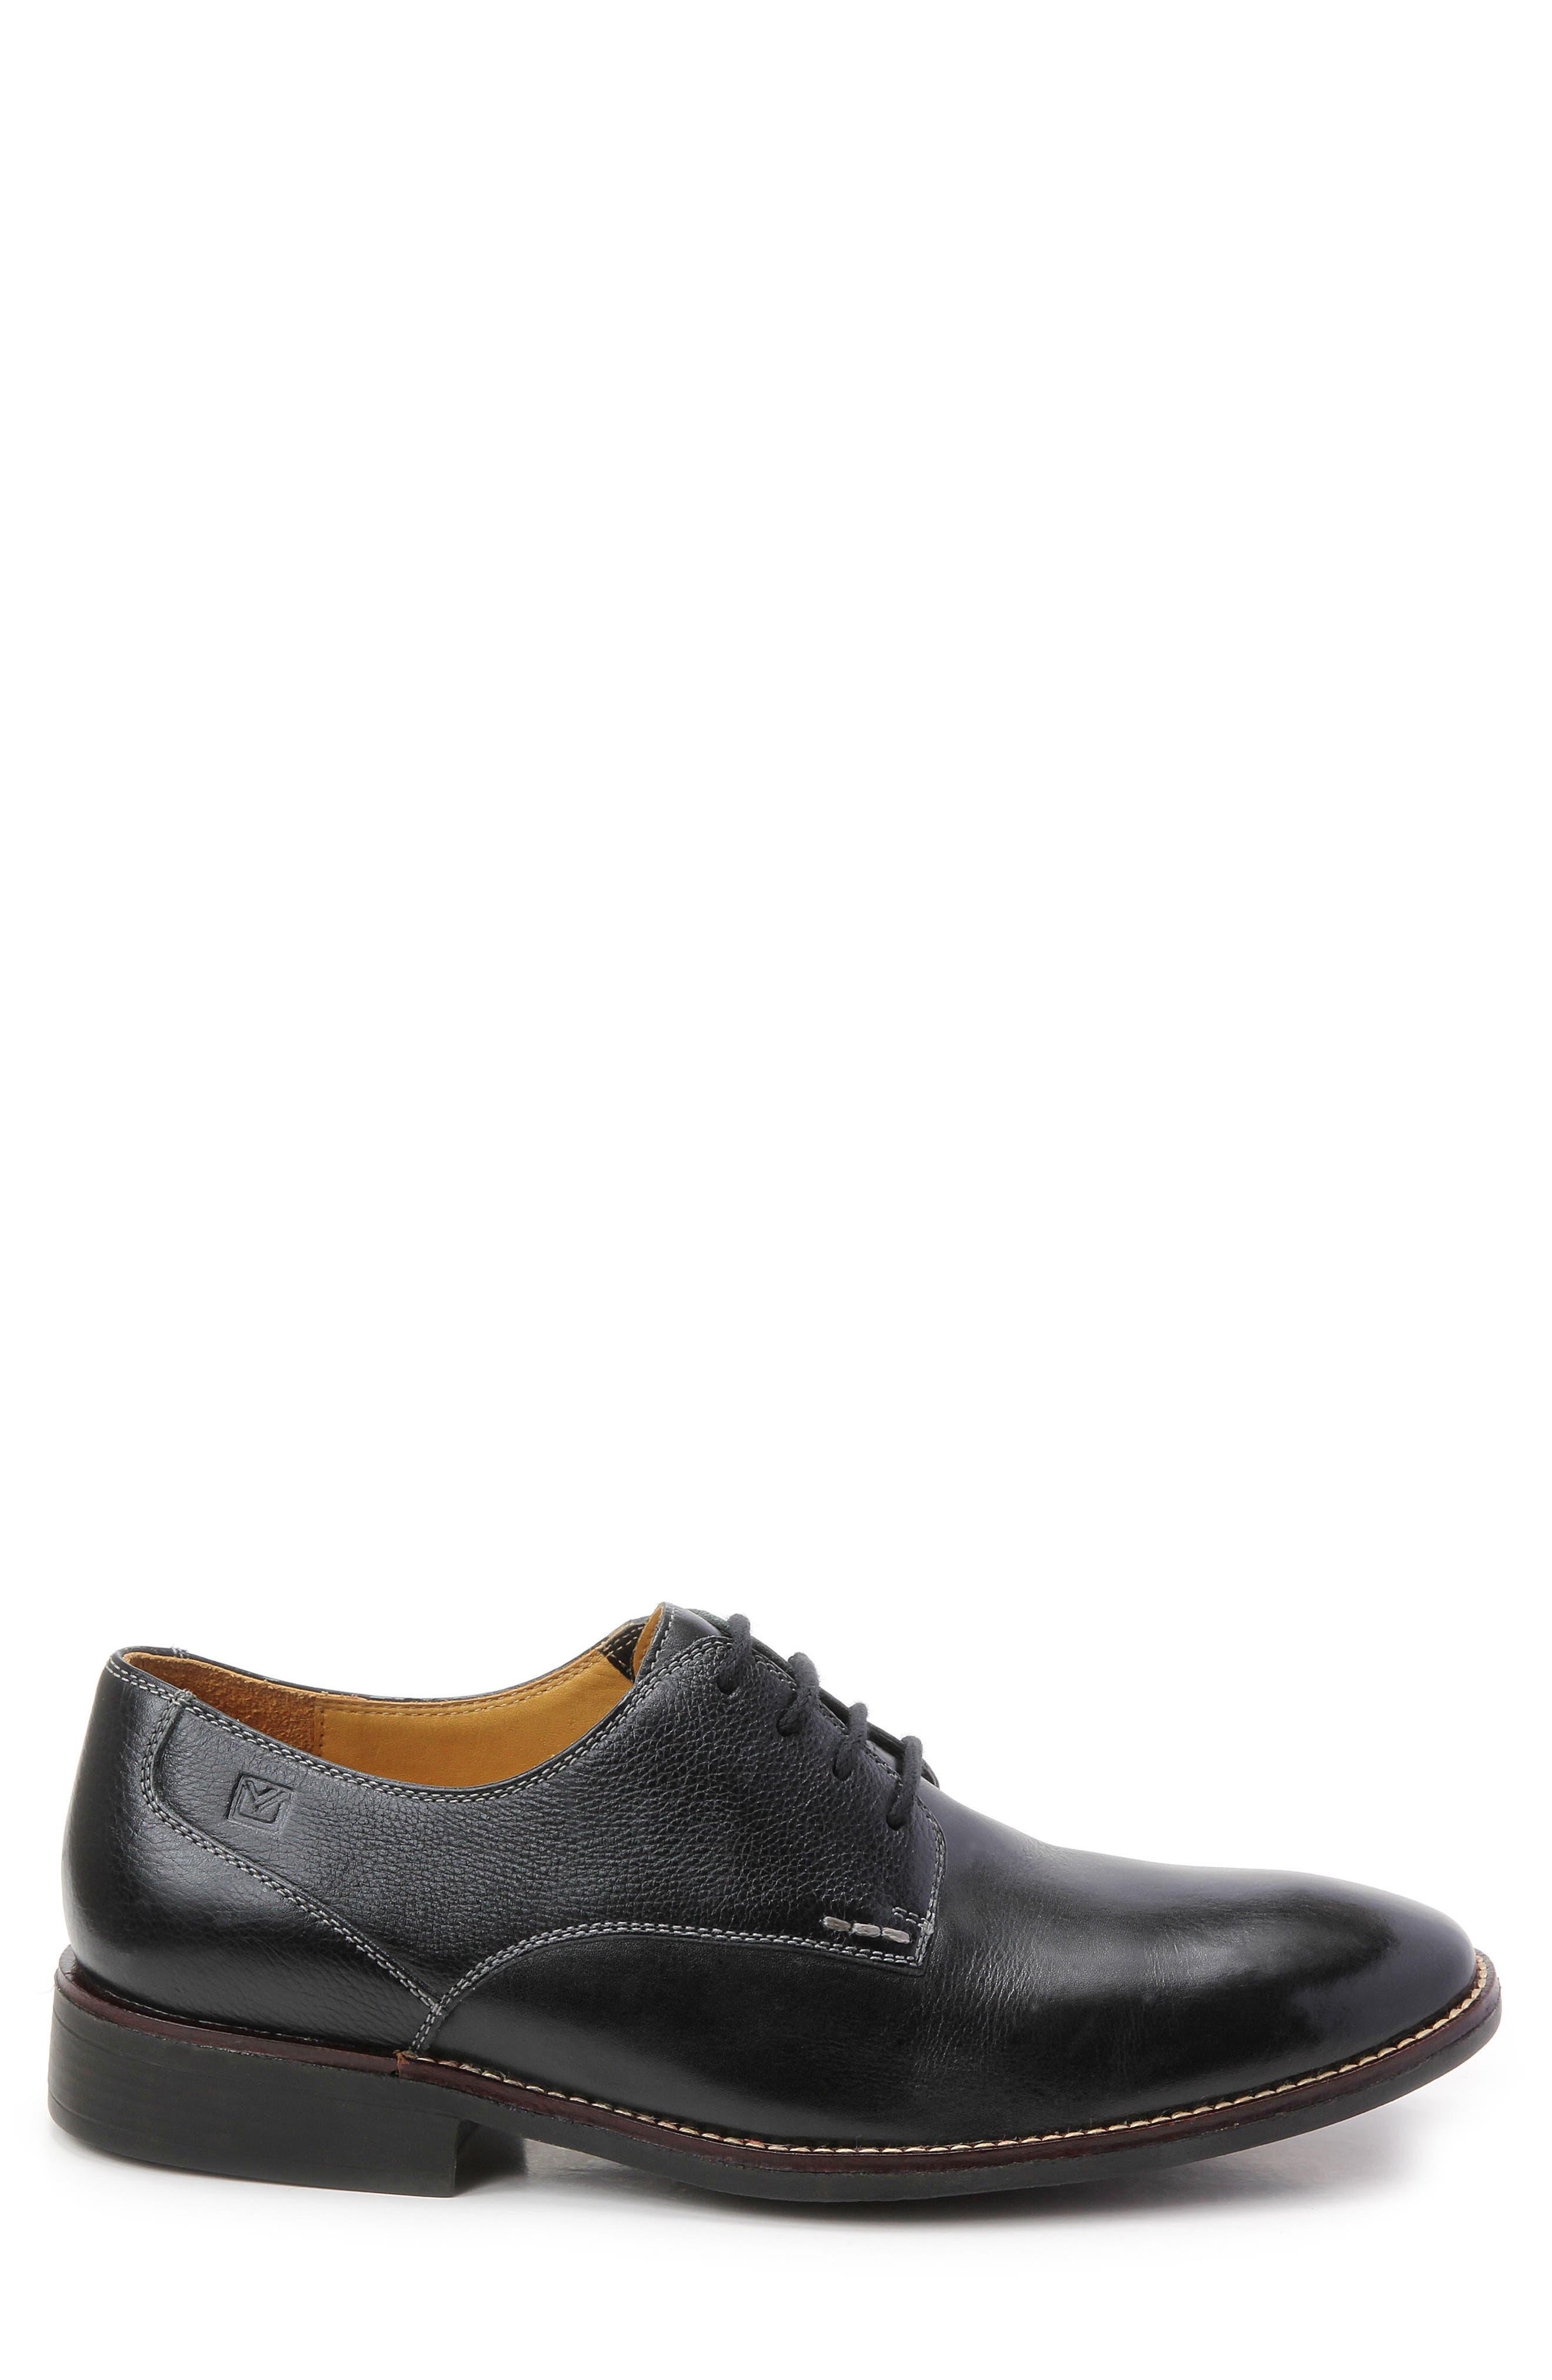 'Olsen' Plain Toe Derby,                             Alternate thumbnail 3, color,                             BLACK LEATHER